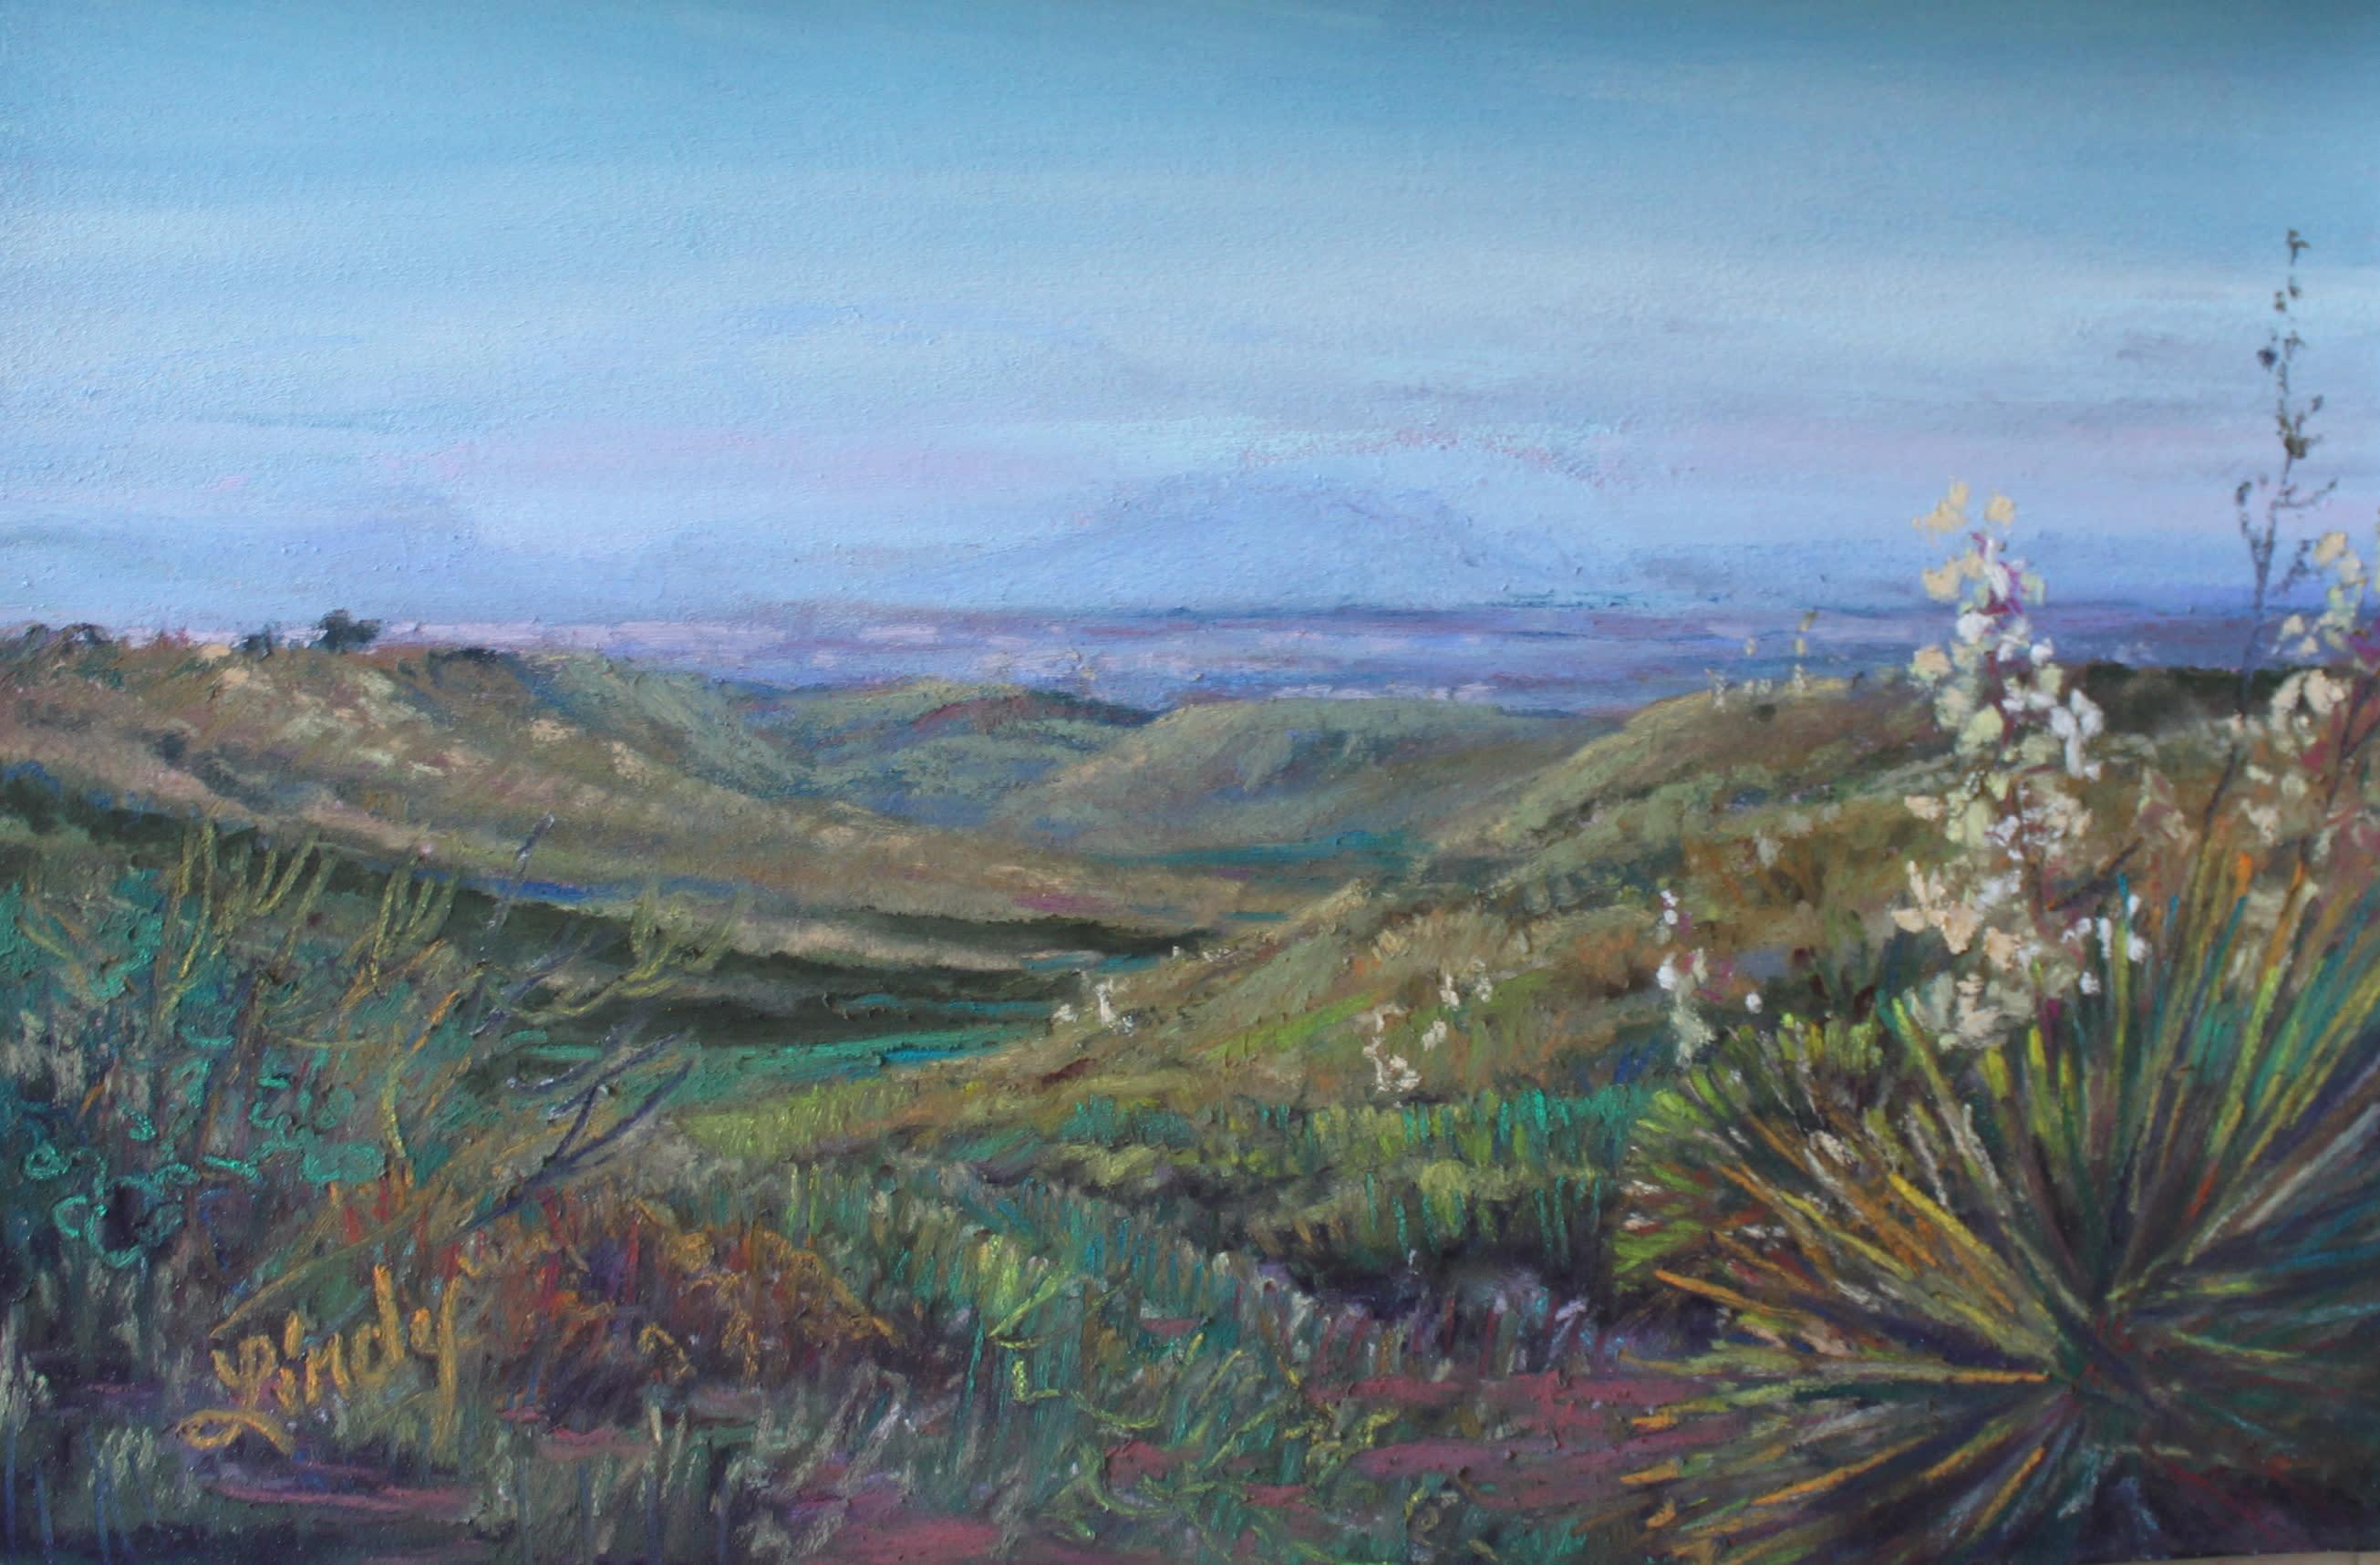 Chinati from the marfa highlands 4x6 pastel lindy c severns u3rlcb